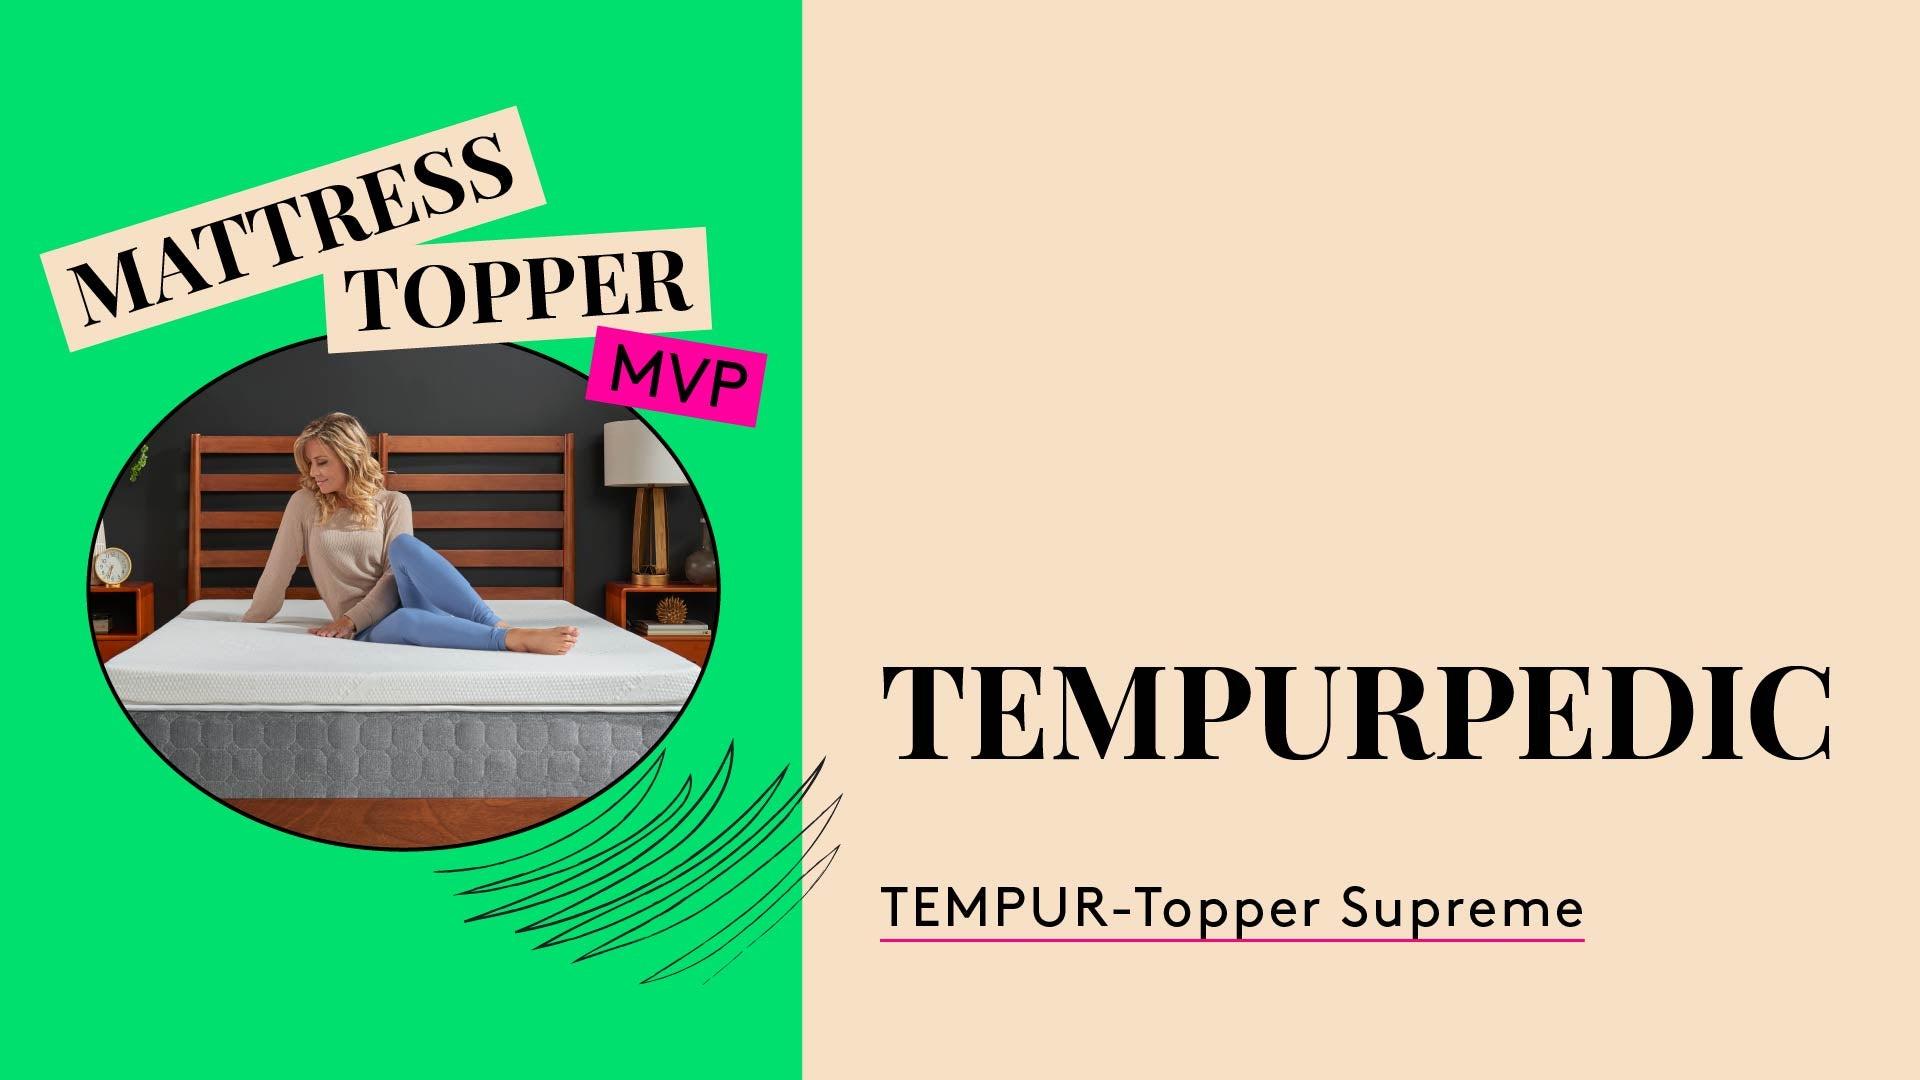 Mattress Topper MVP Awards. TEMPURPEDIC - TEMPER-Topper Supreme. A photo of a woman sitting on a mattress.